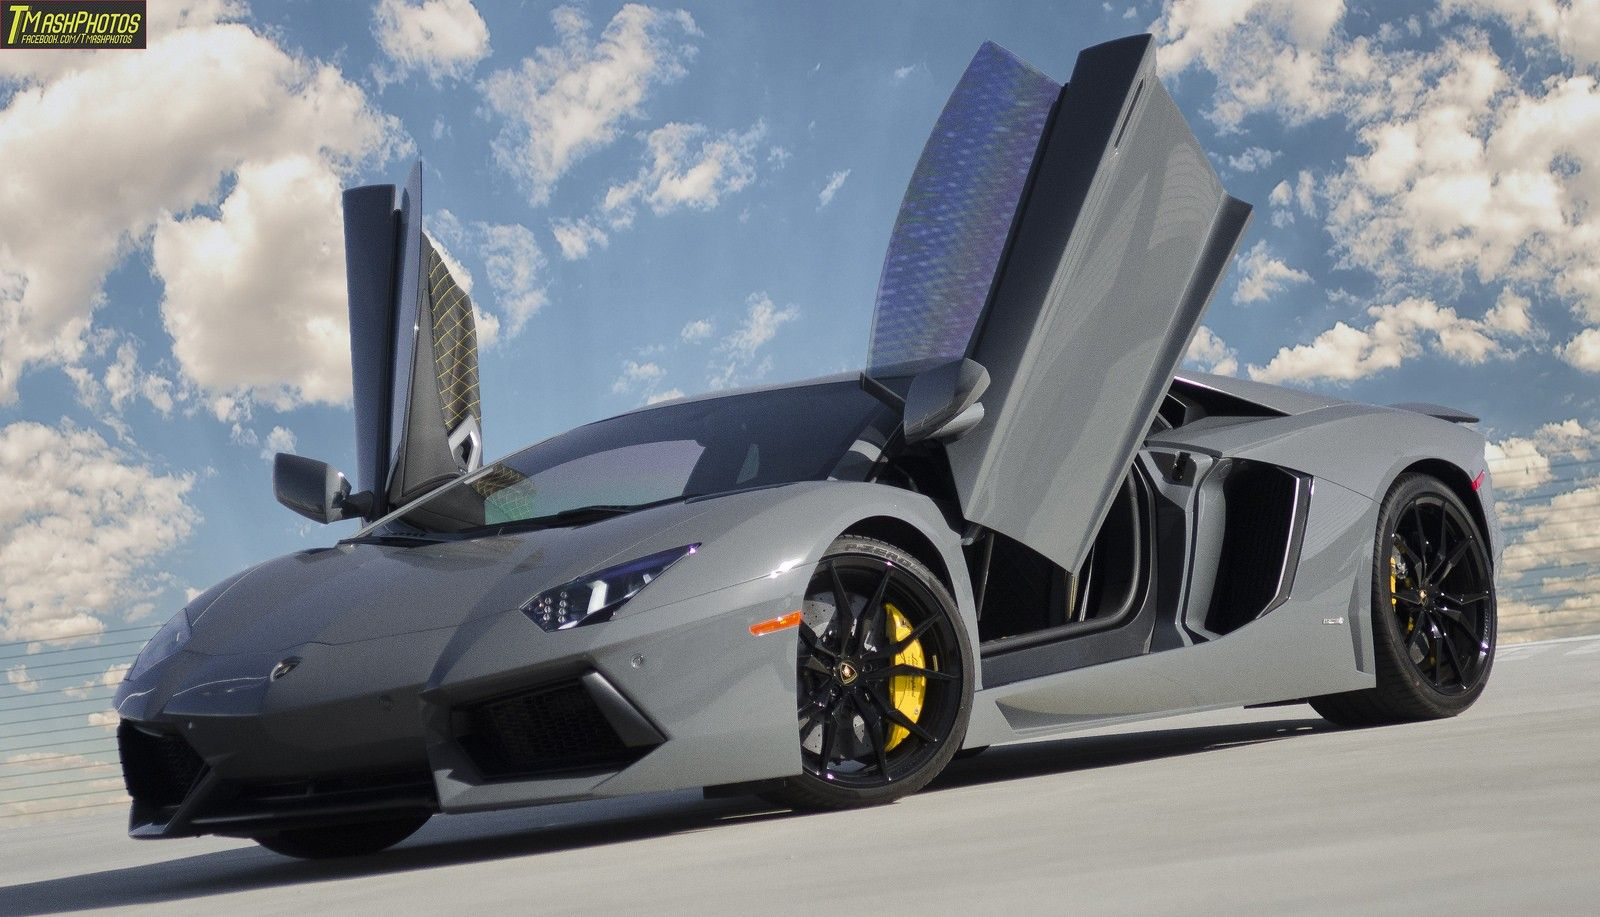 Grigio Telesto Lamborghini Aventador Scissor Doors Gallery Lamborghini Aventador Lamborghini Car Bling